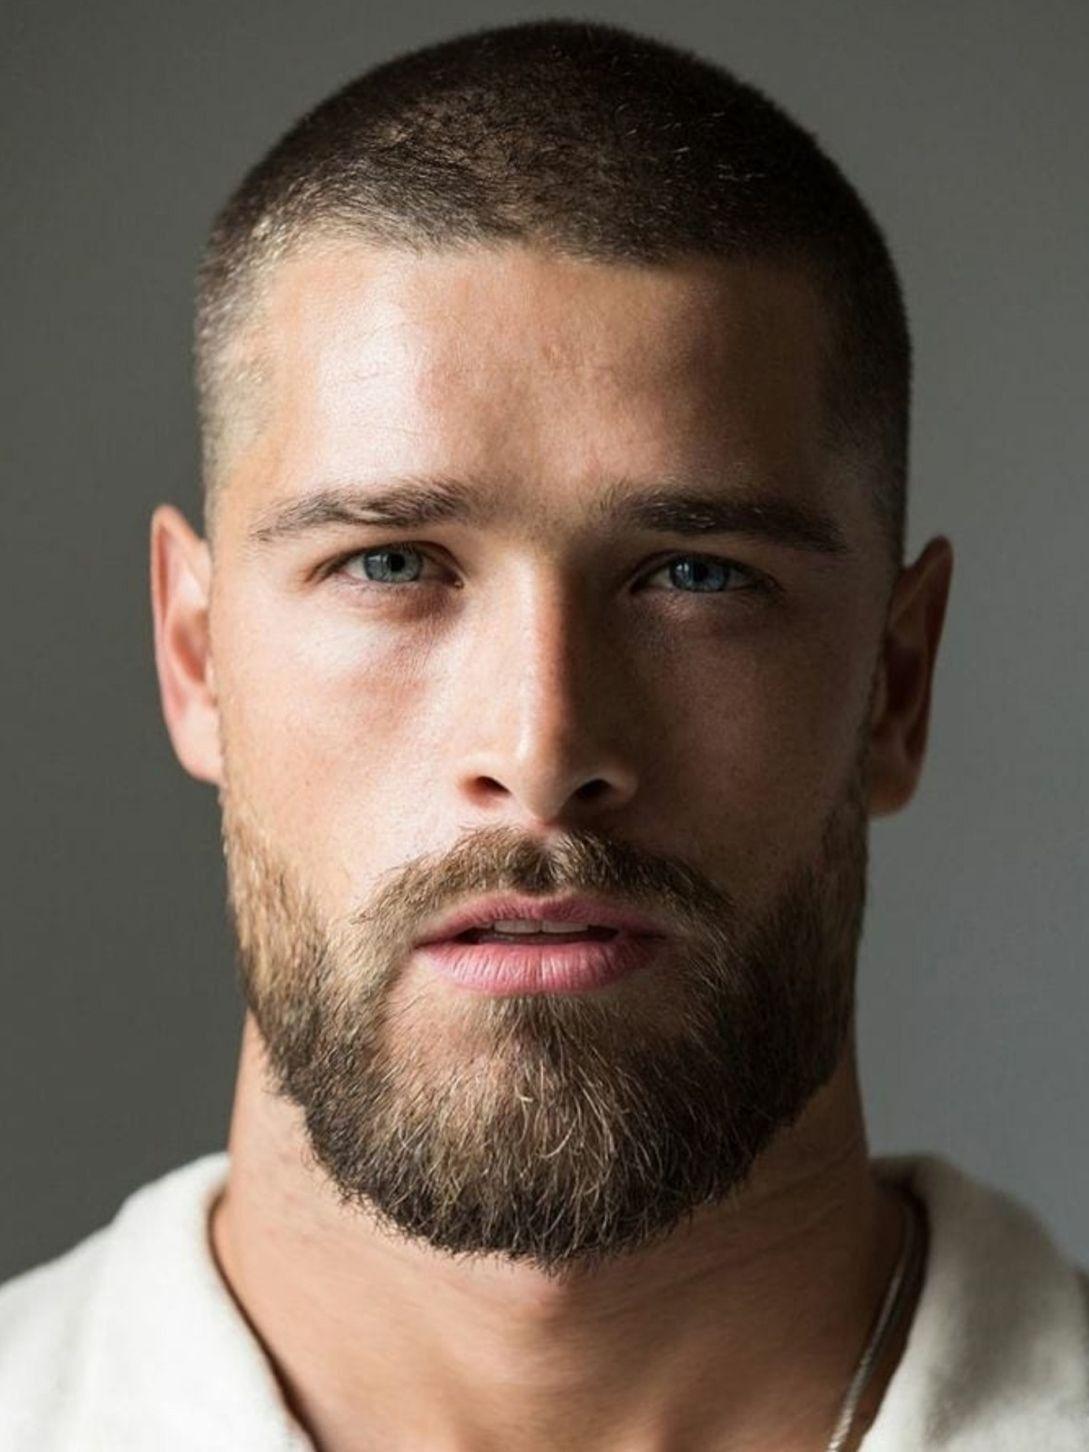 900 Facial Expressions Ideas In 2021 Bearded Men Hair And Beard Styles Beard Styles